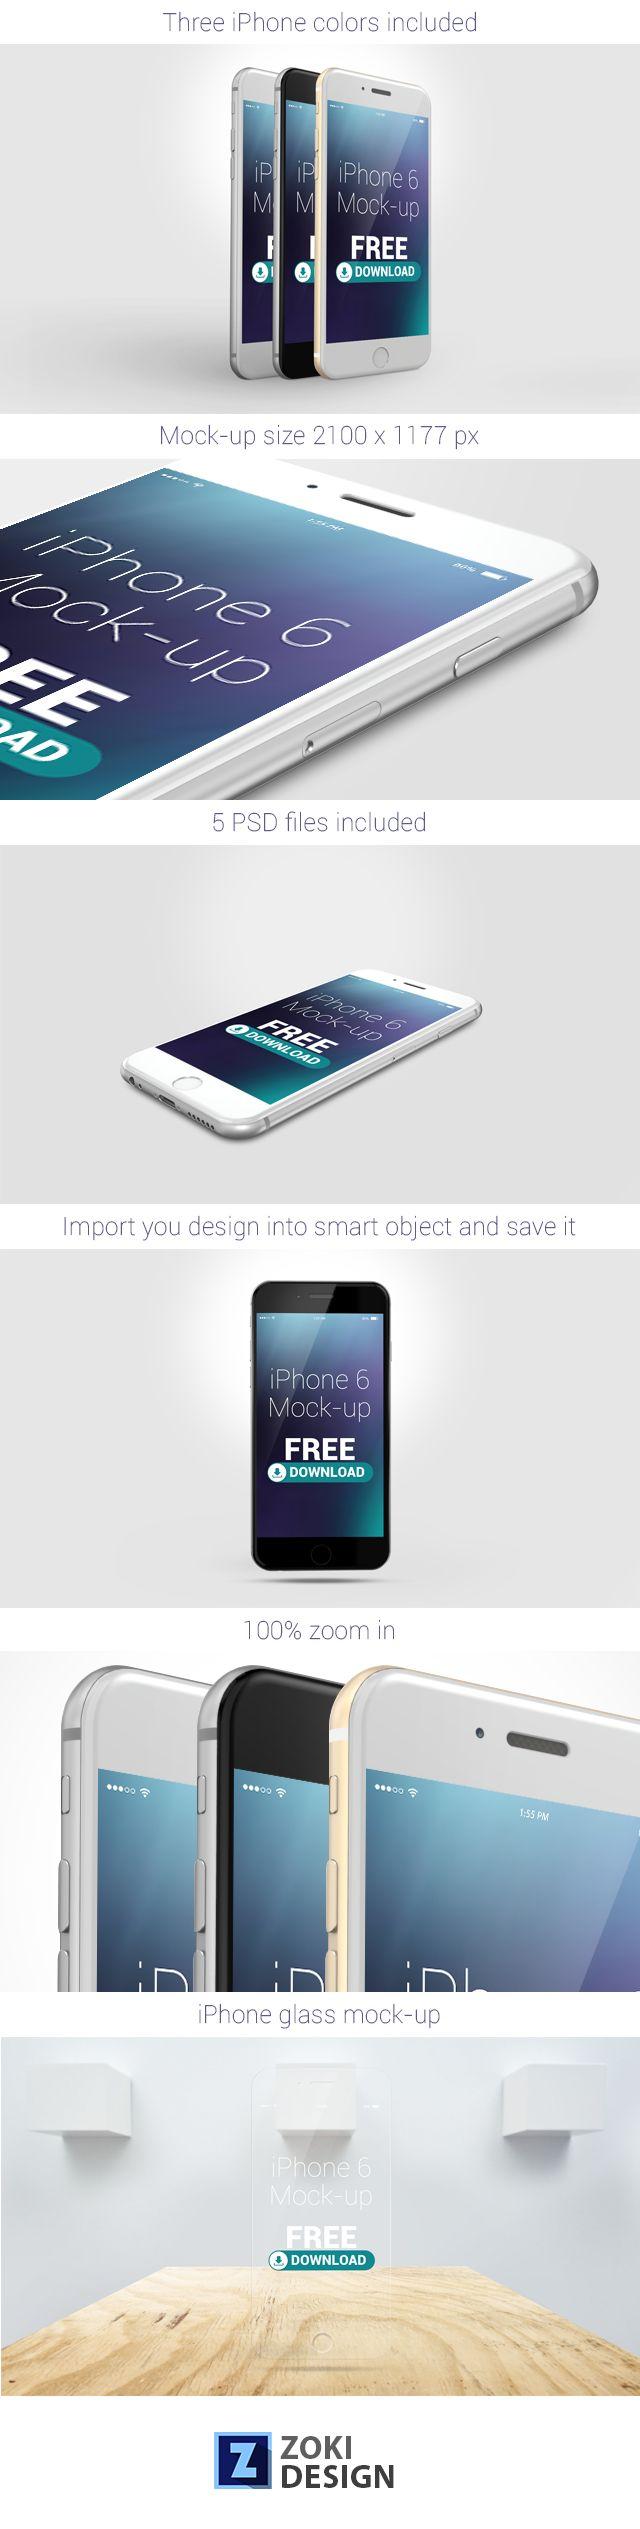 free_iPhone_mock_up_3